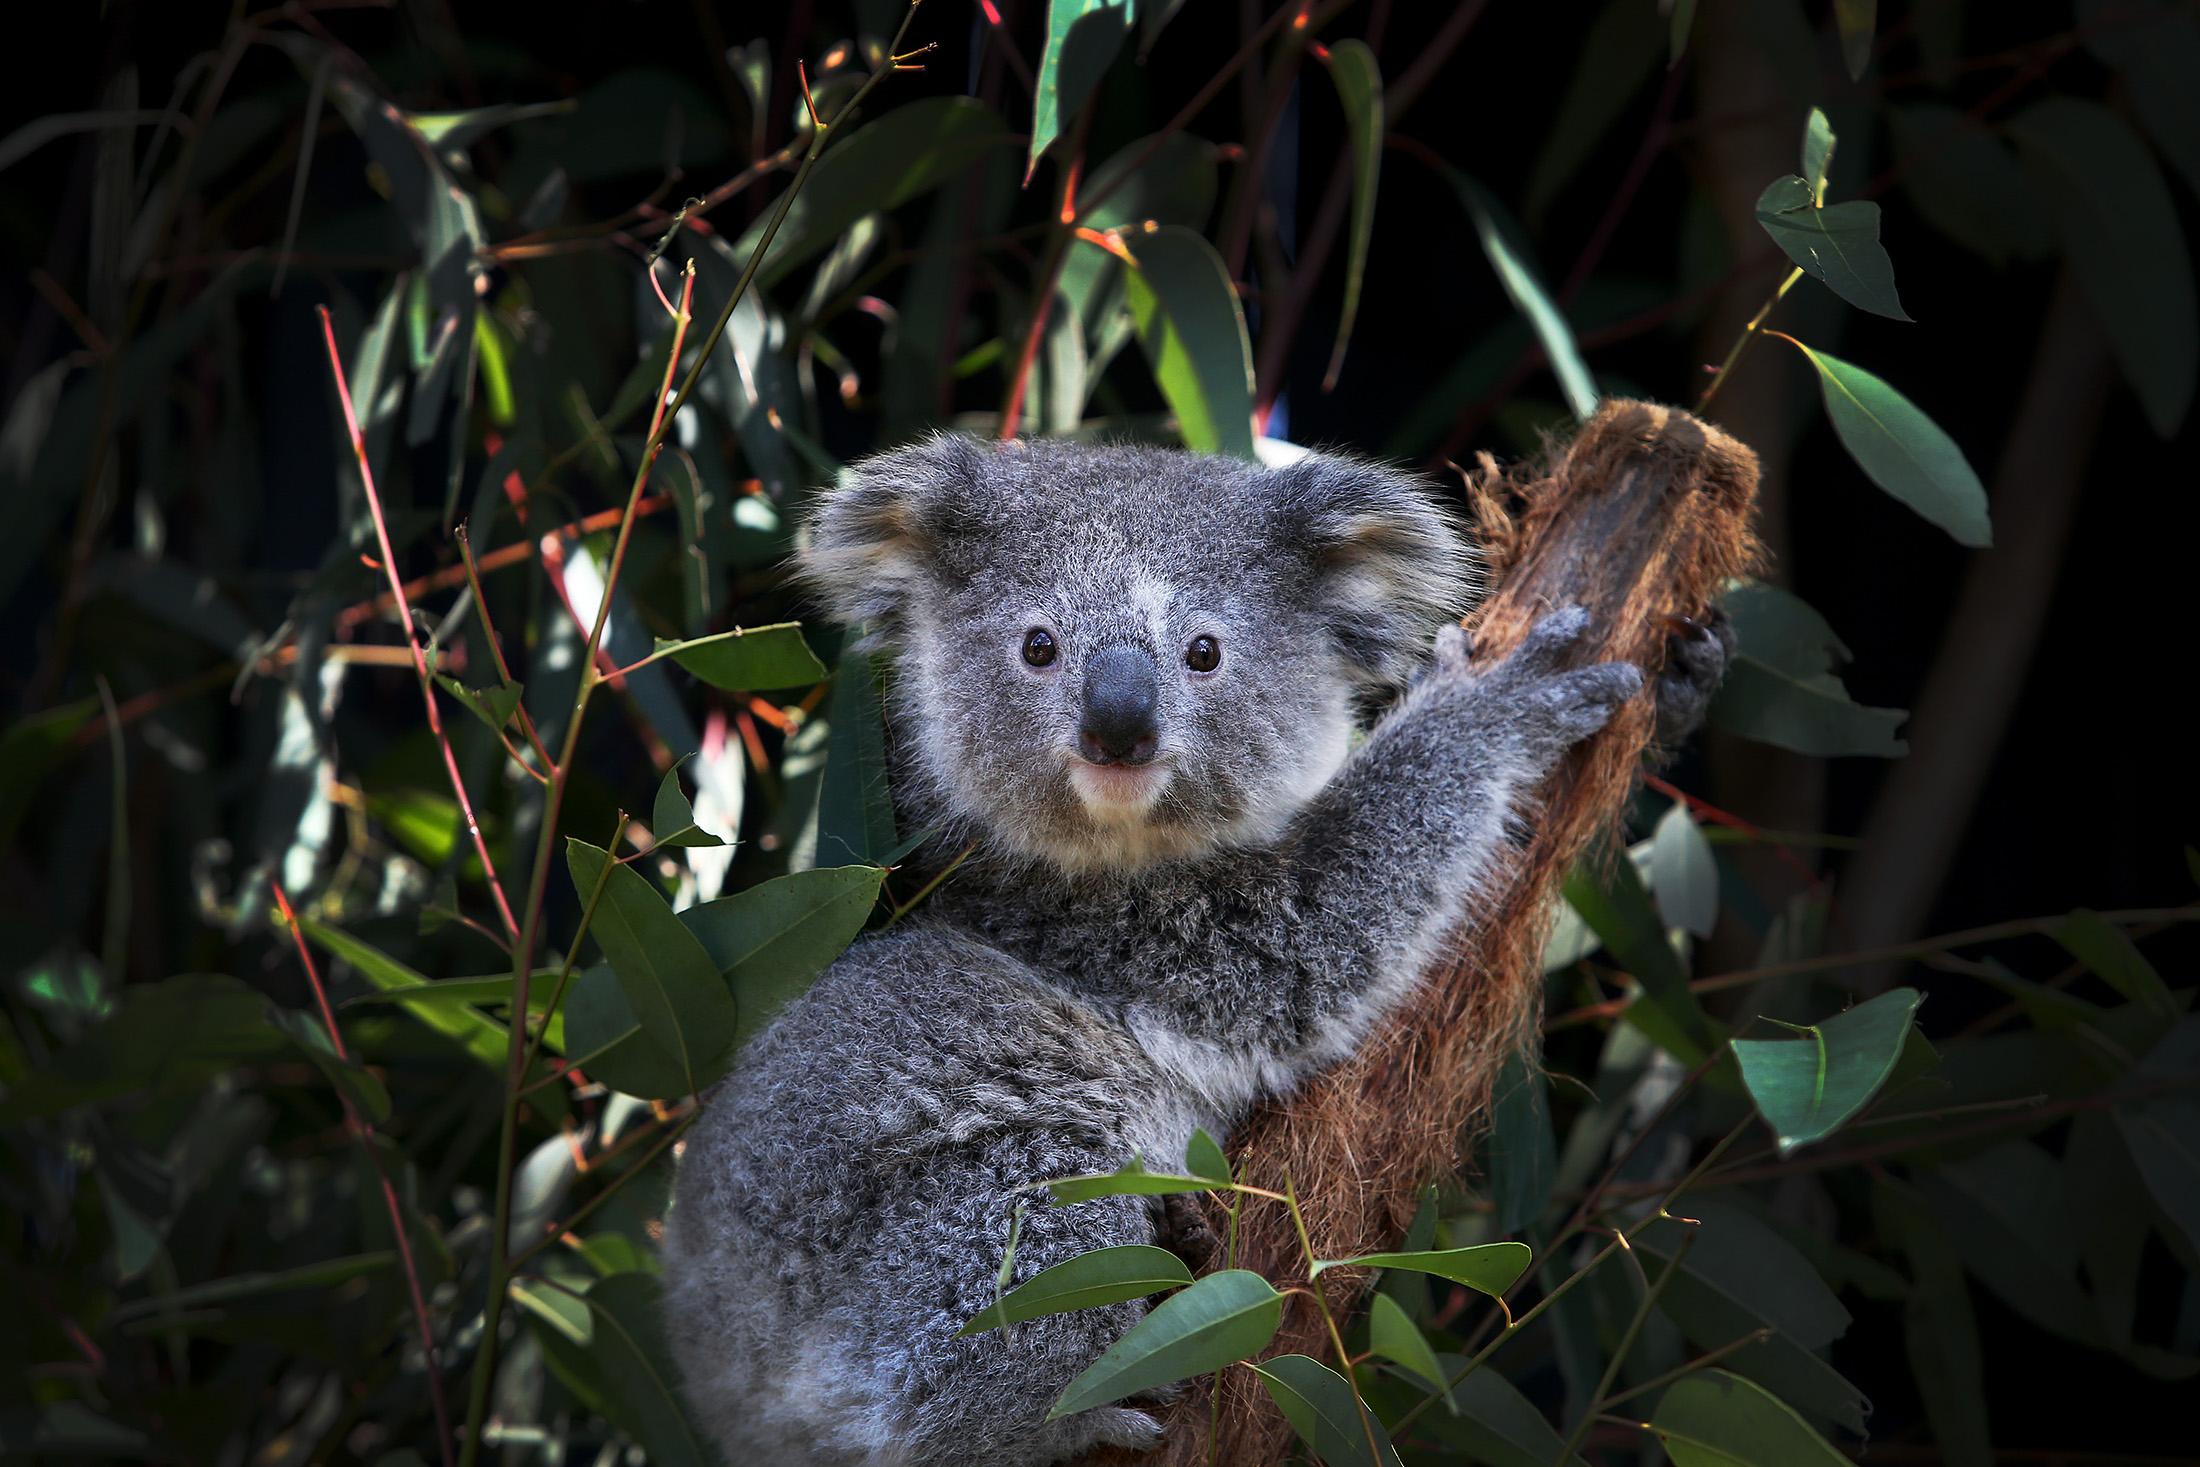 NSW Works To Save The Koala As Bushfires, Habitat Loss And Disease Threaten Future Of Australia's Iconic Animal